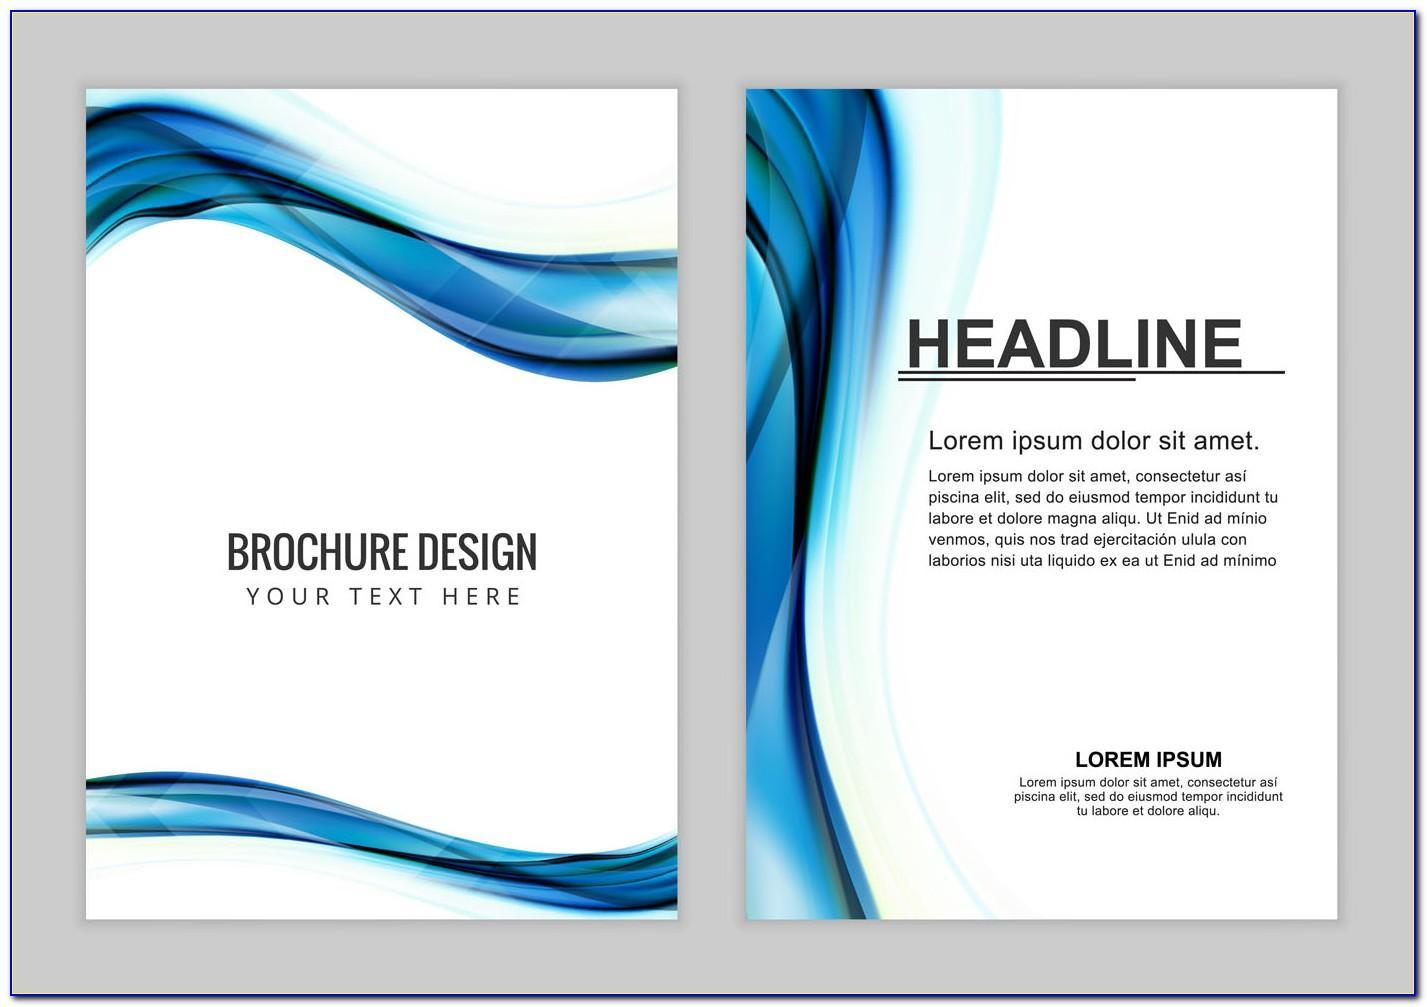 Brochure Background Designs